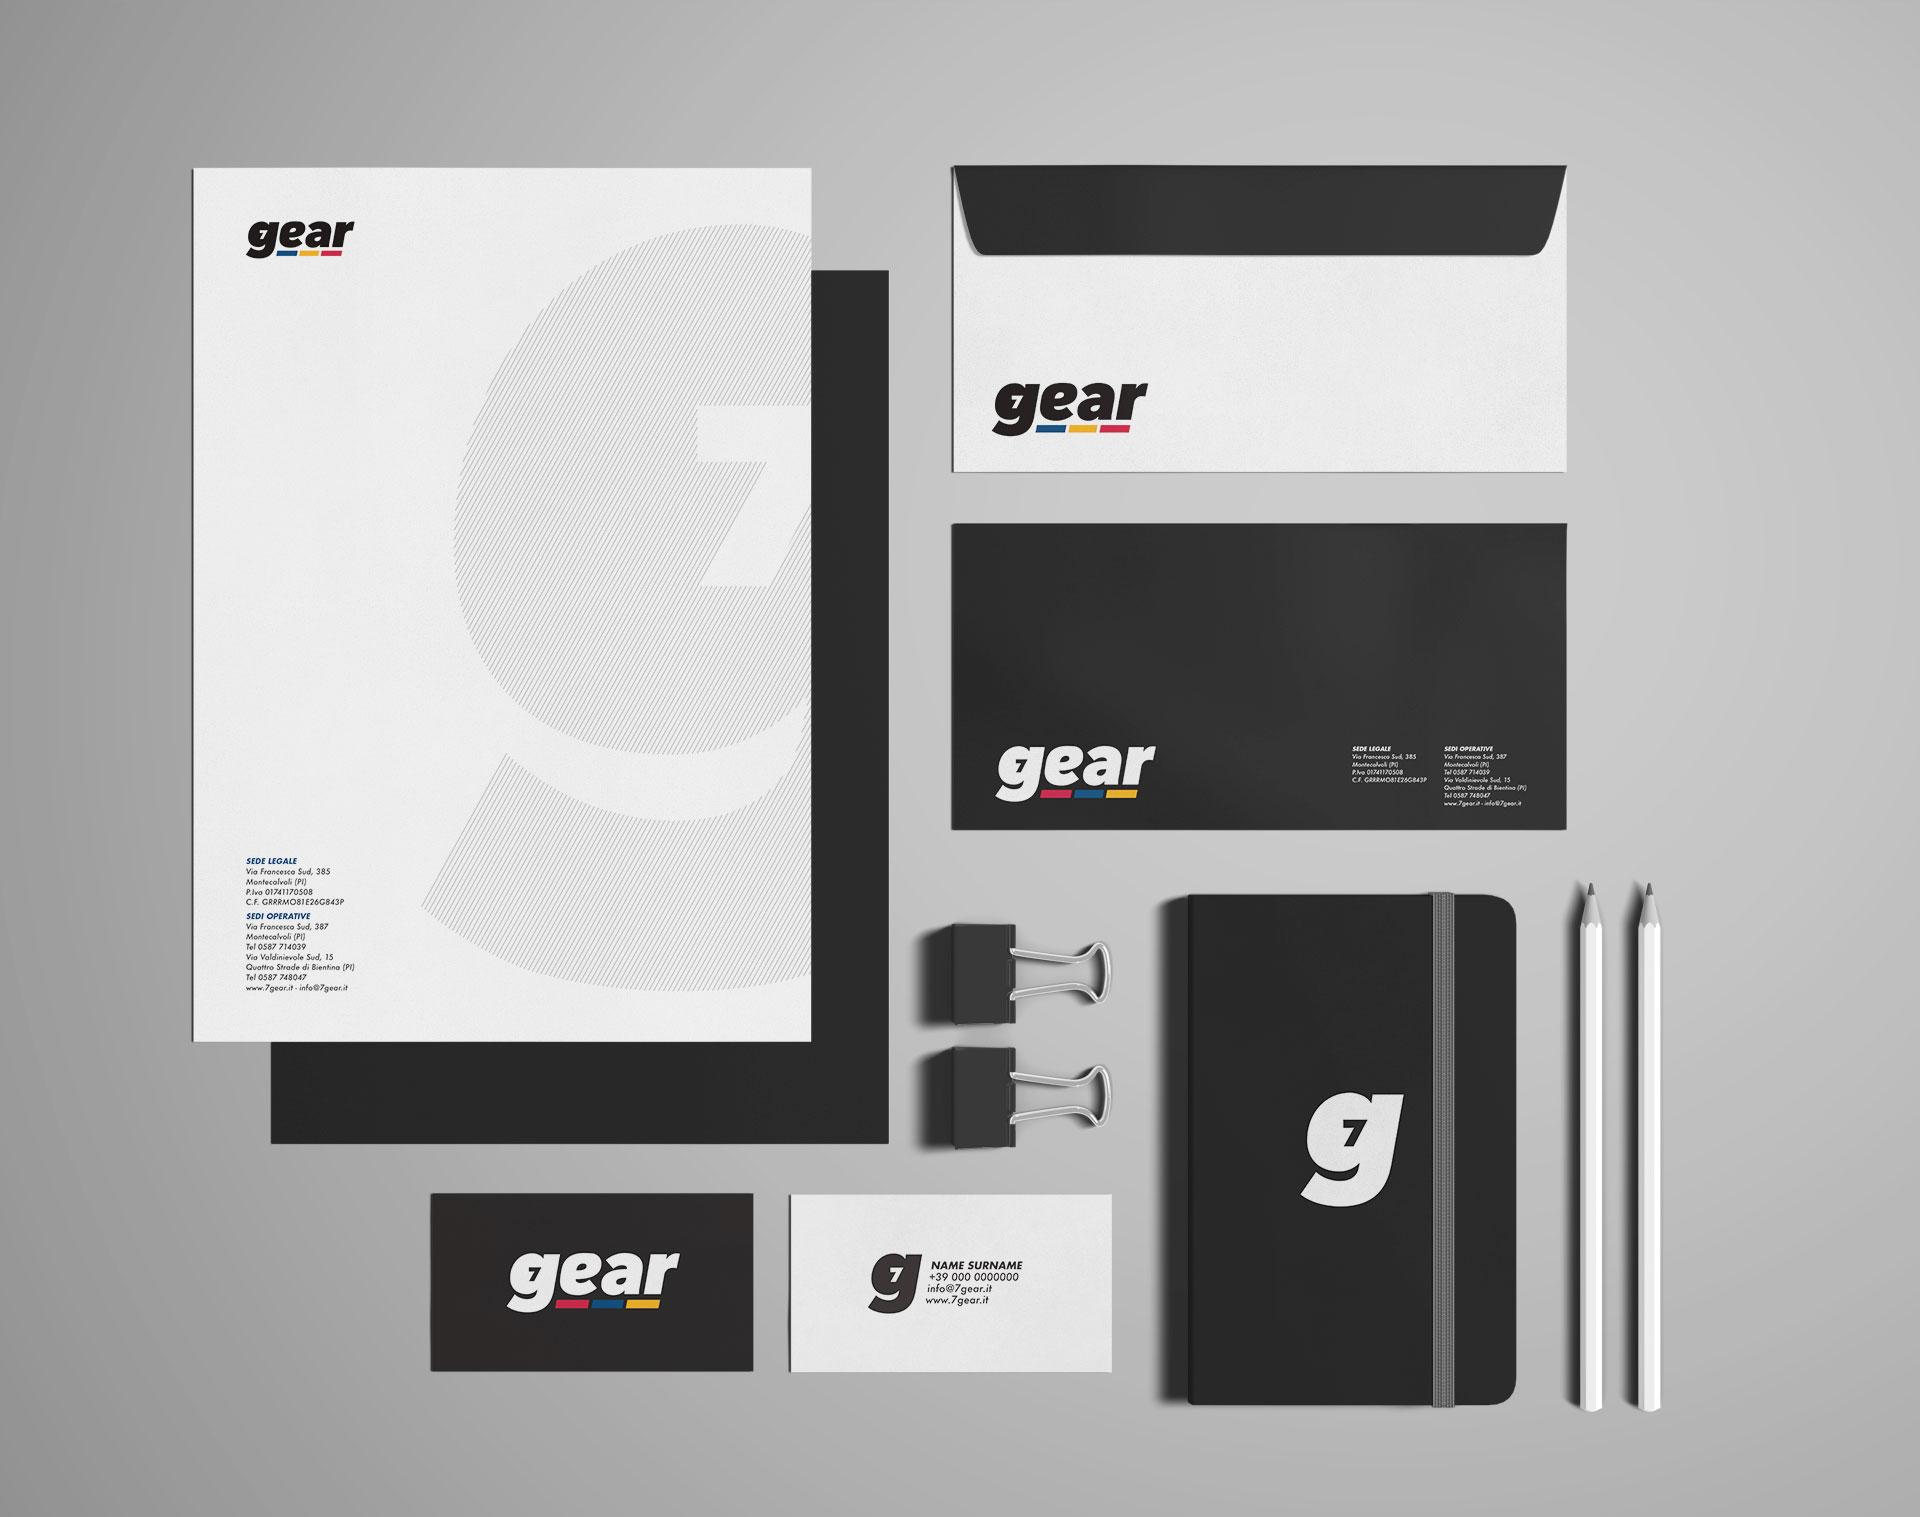 7gear-corporate-identity